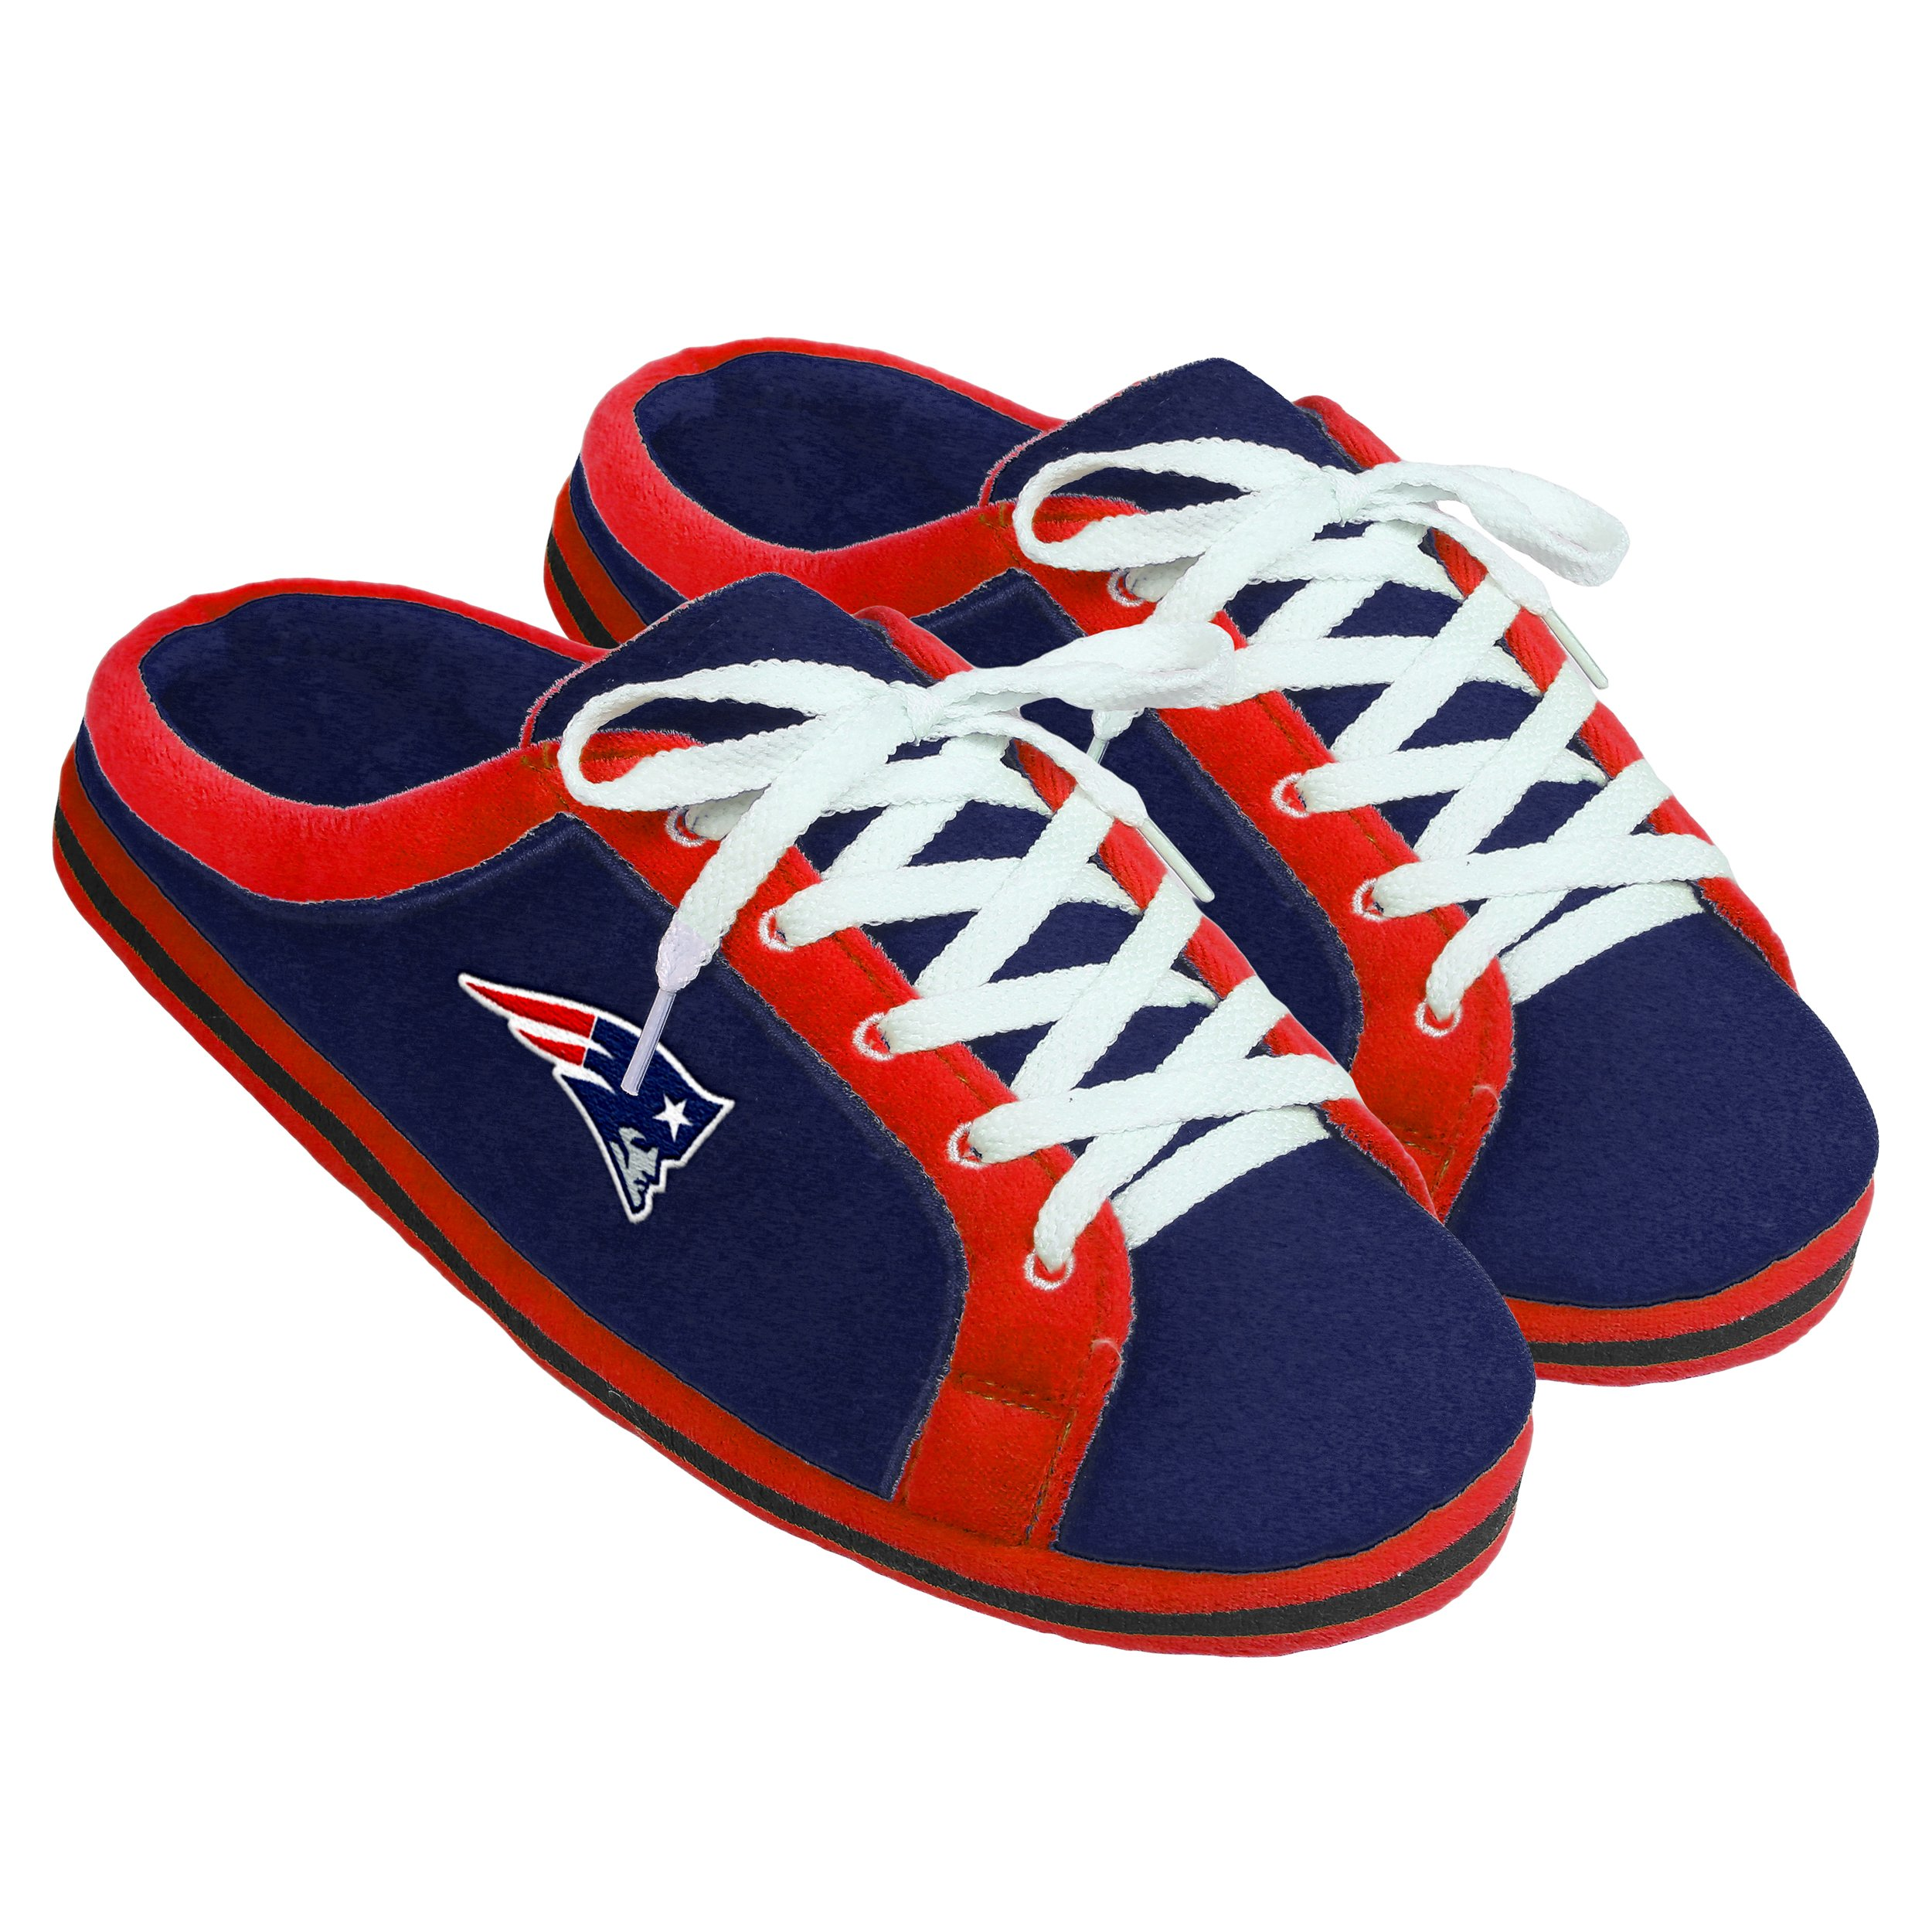 New England Patriots Sneaker Slide Slipper Small